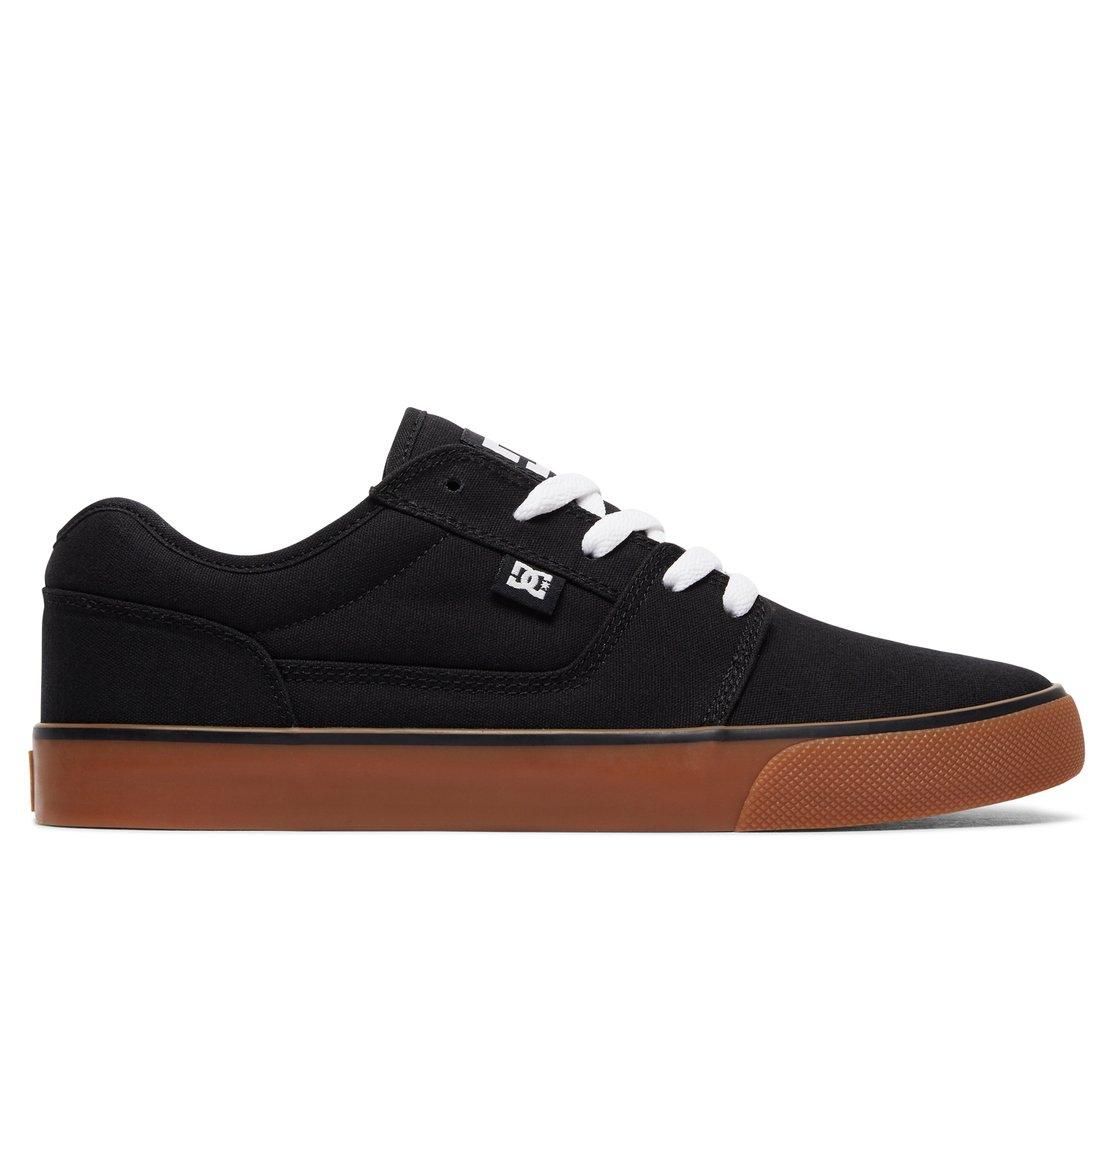 Dc Shoes Men S Trase Tx Se Skate Shoes